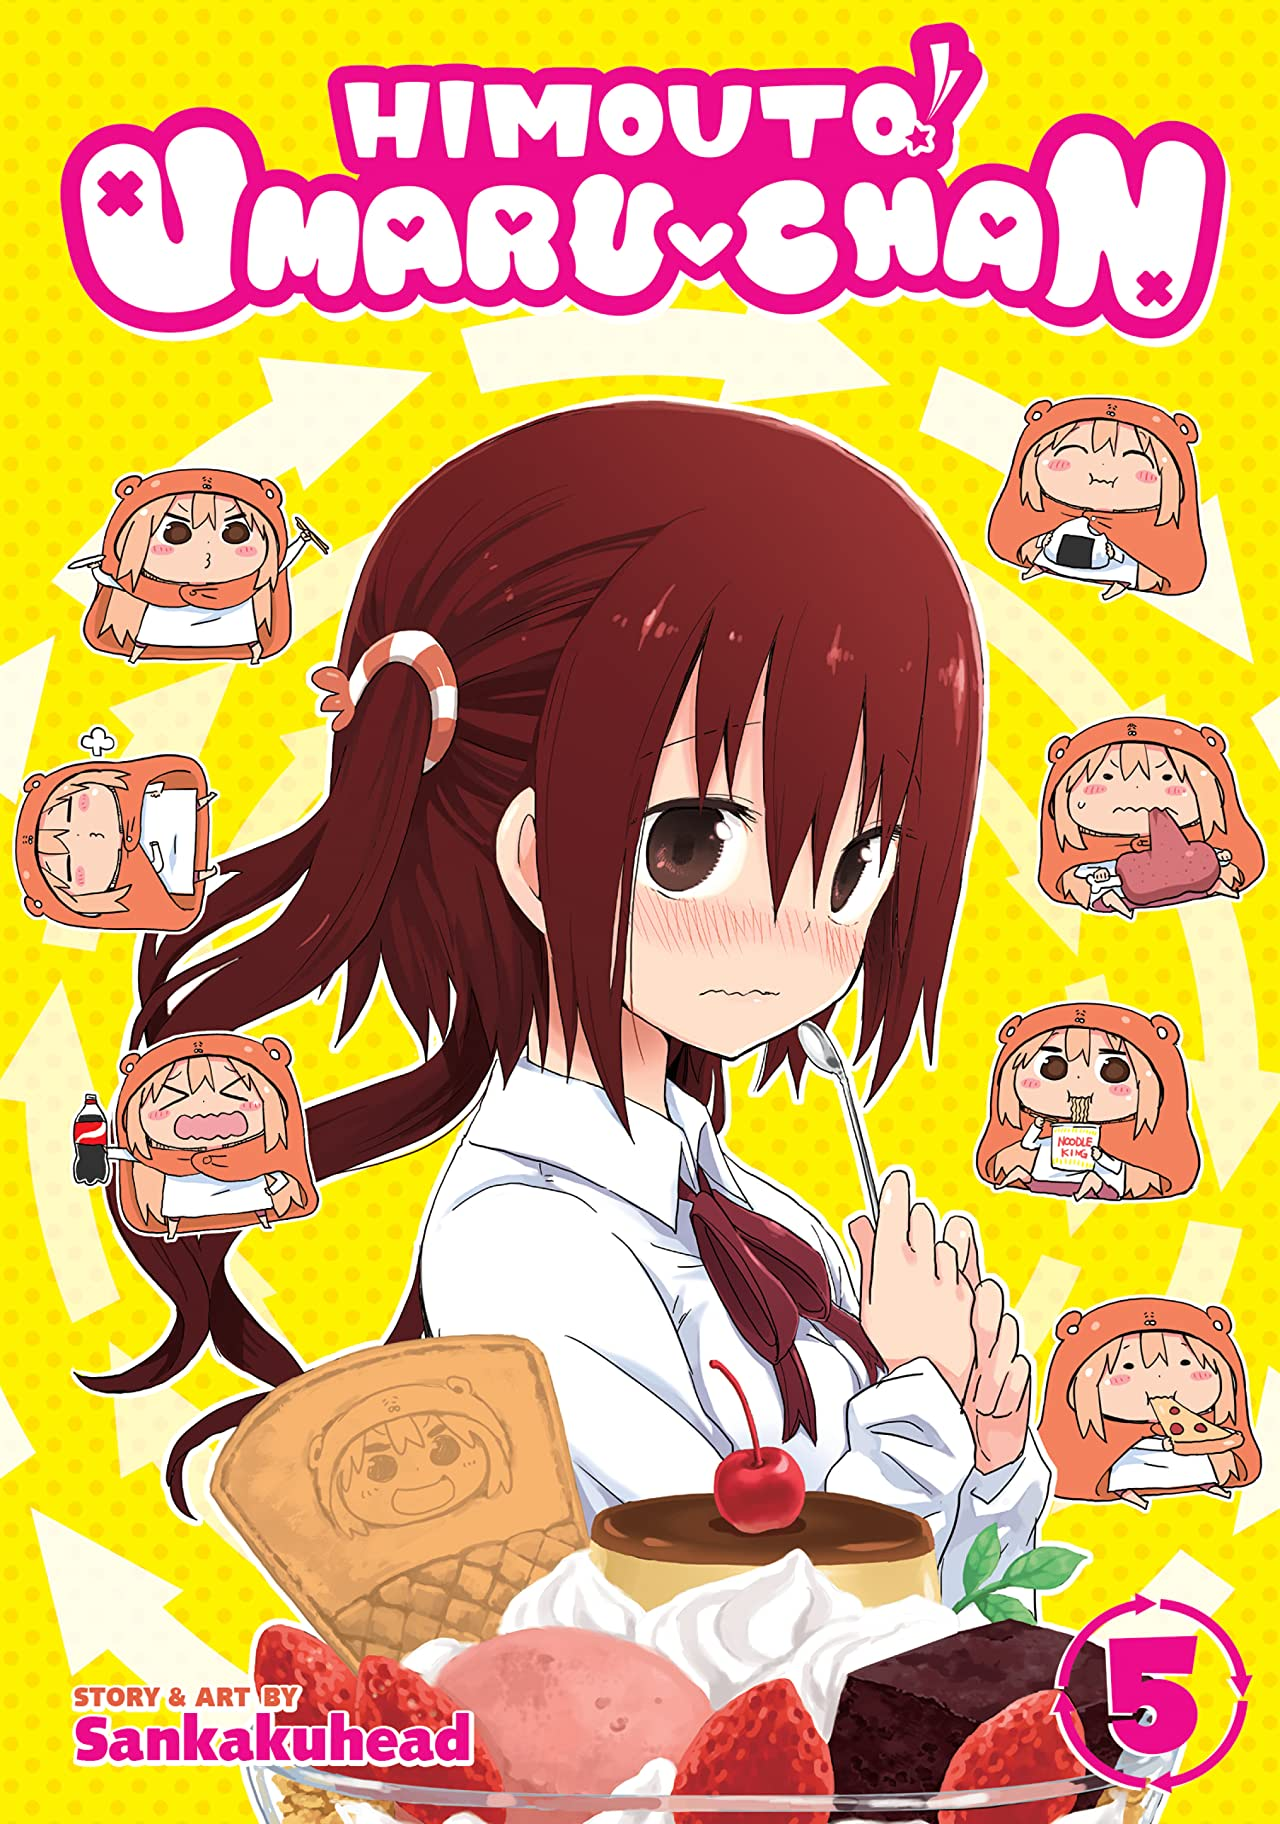 Himouto! Umaru-chan Vol. 5